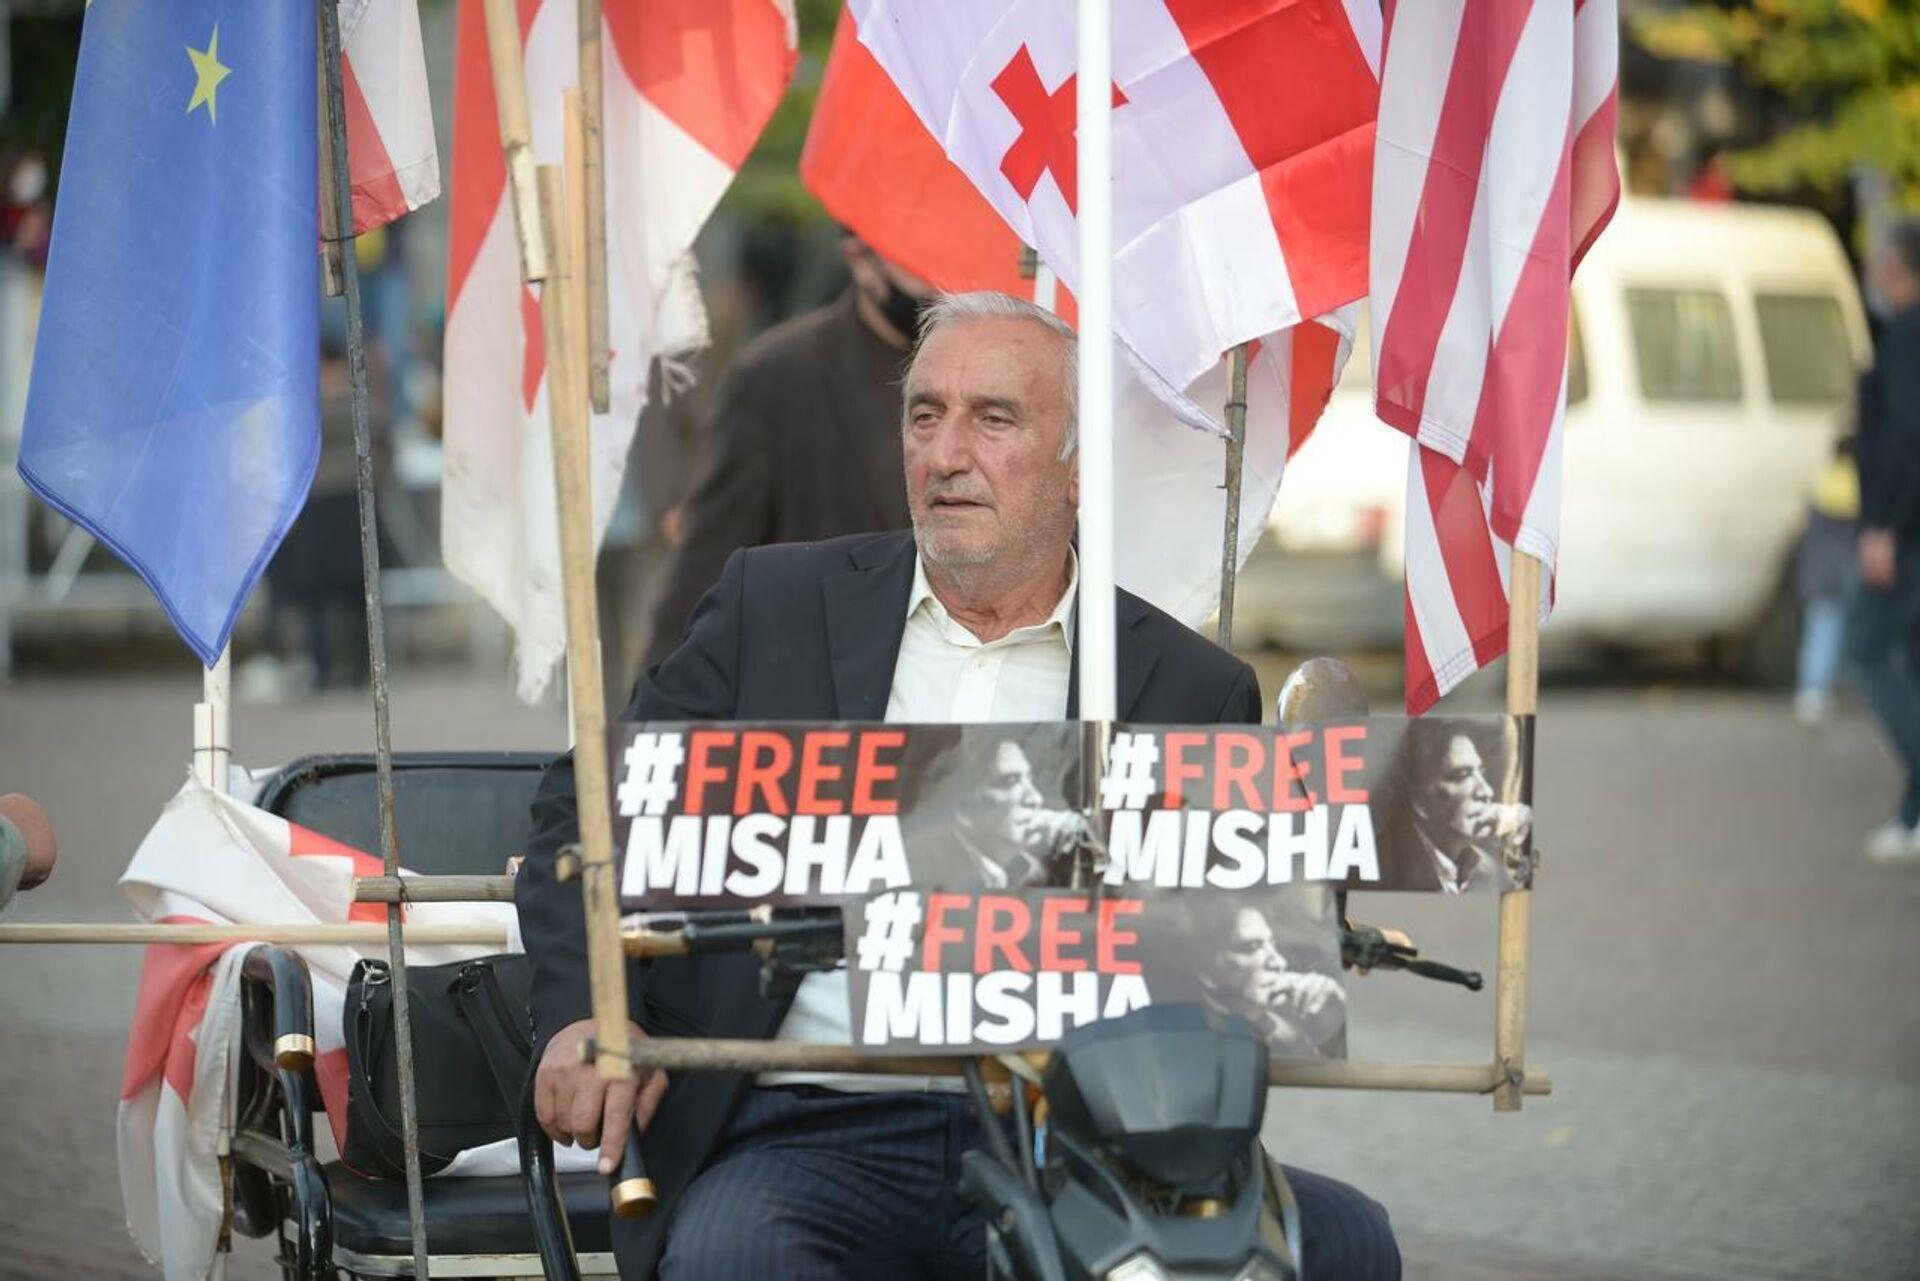 Свободу Саакашвили - акция протеста оппозиции и ЕНД на площади Свободы 14 октября - Sputnik საქართველო, 1920, 14.10.2021